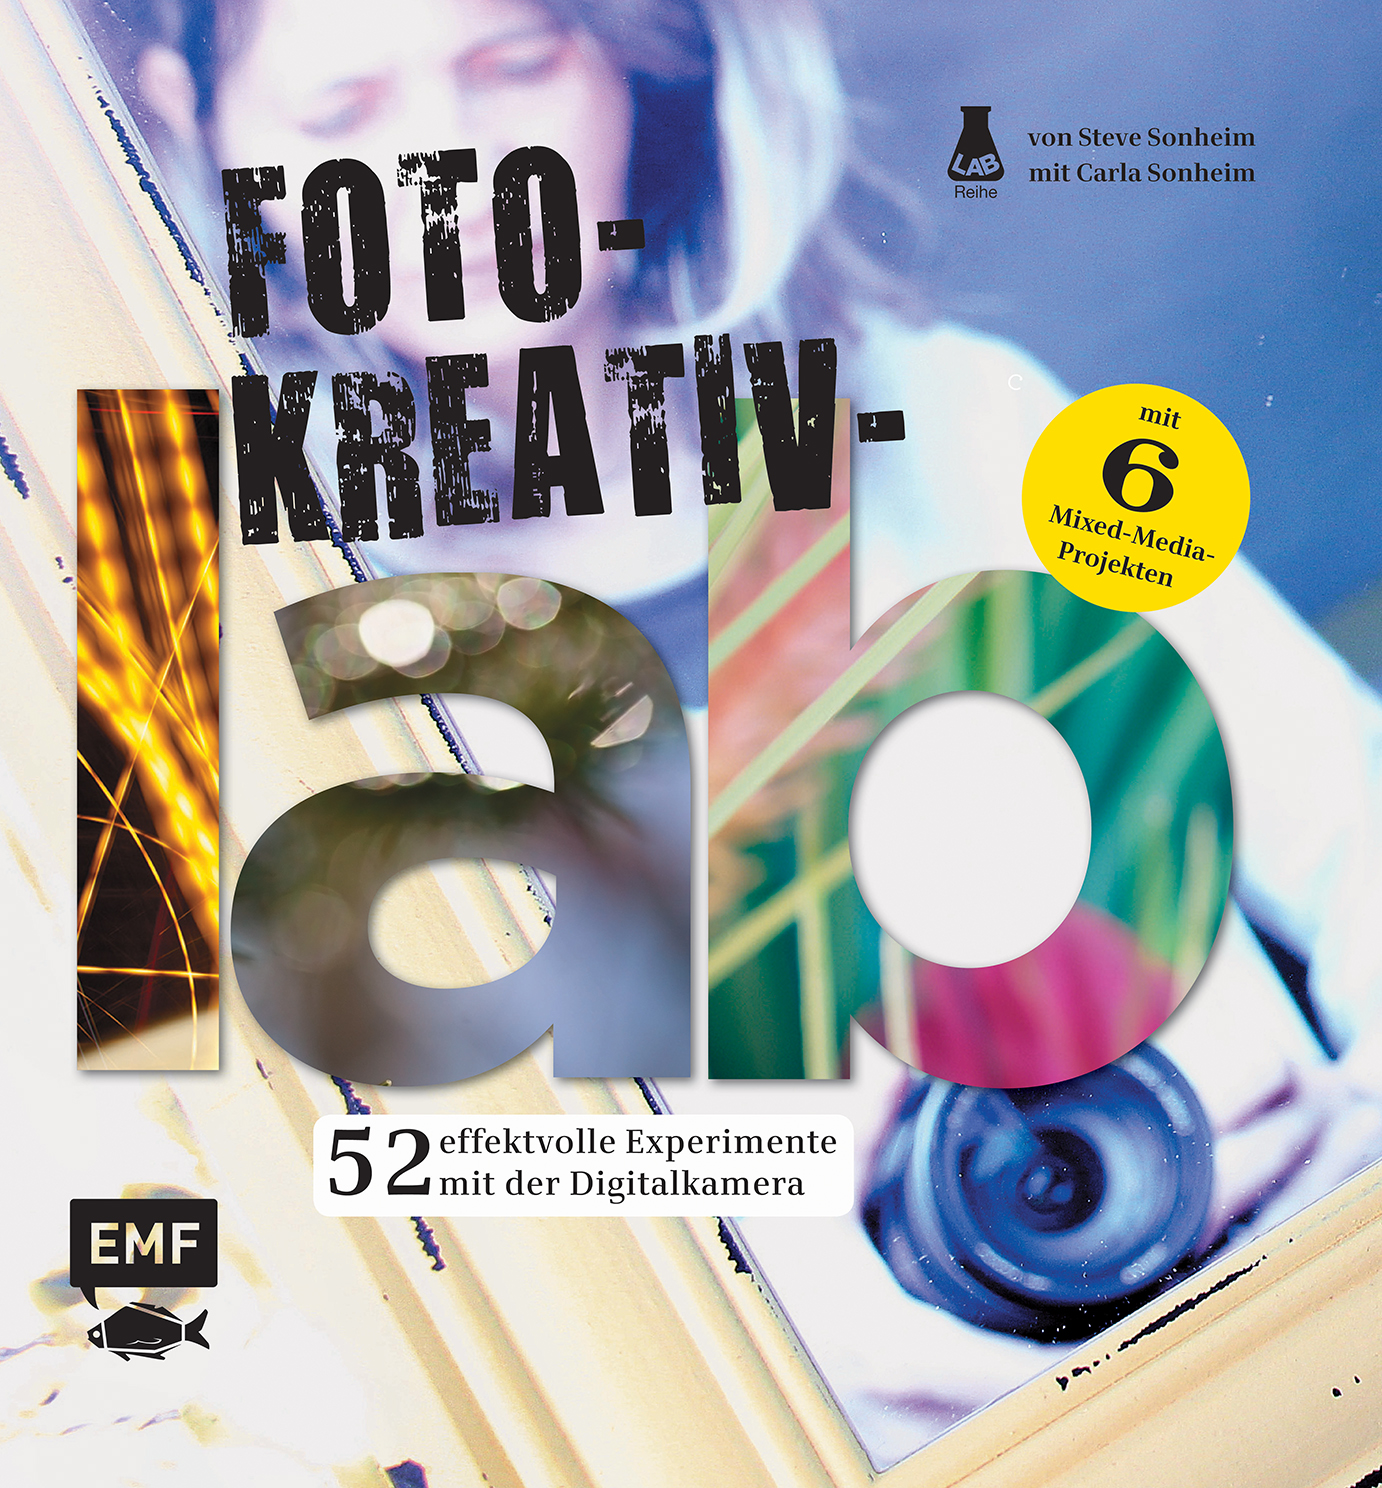 Foto-Kreativ-Lab: 52 effektvolle Experimente mi...